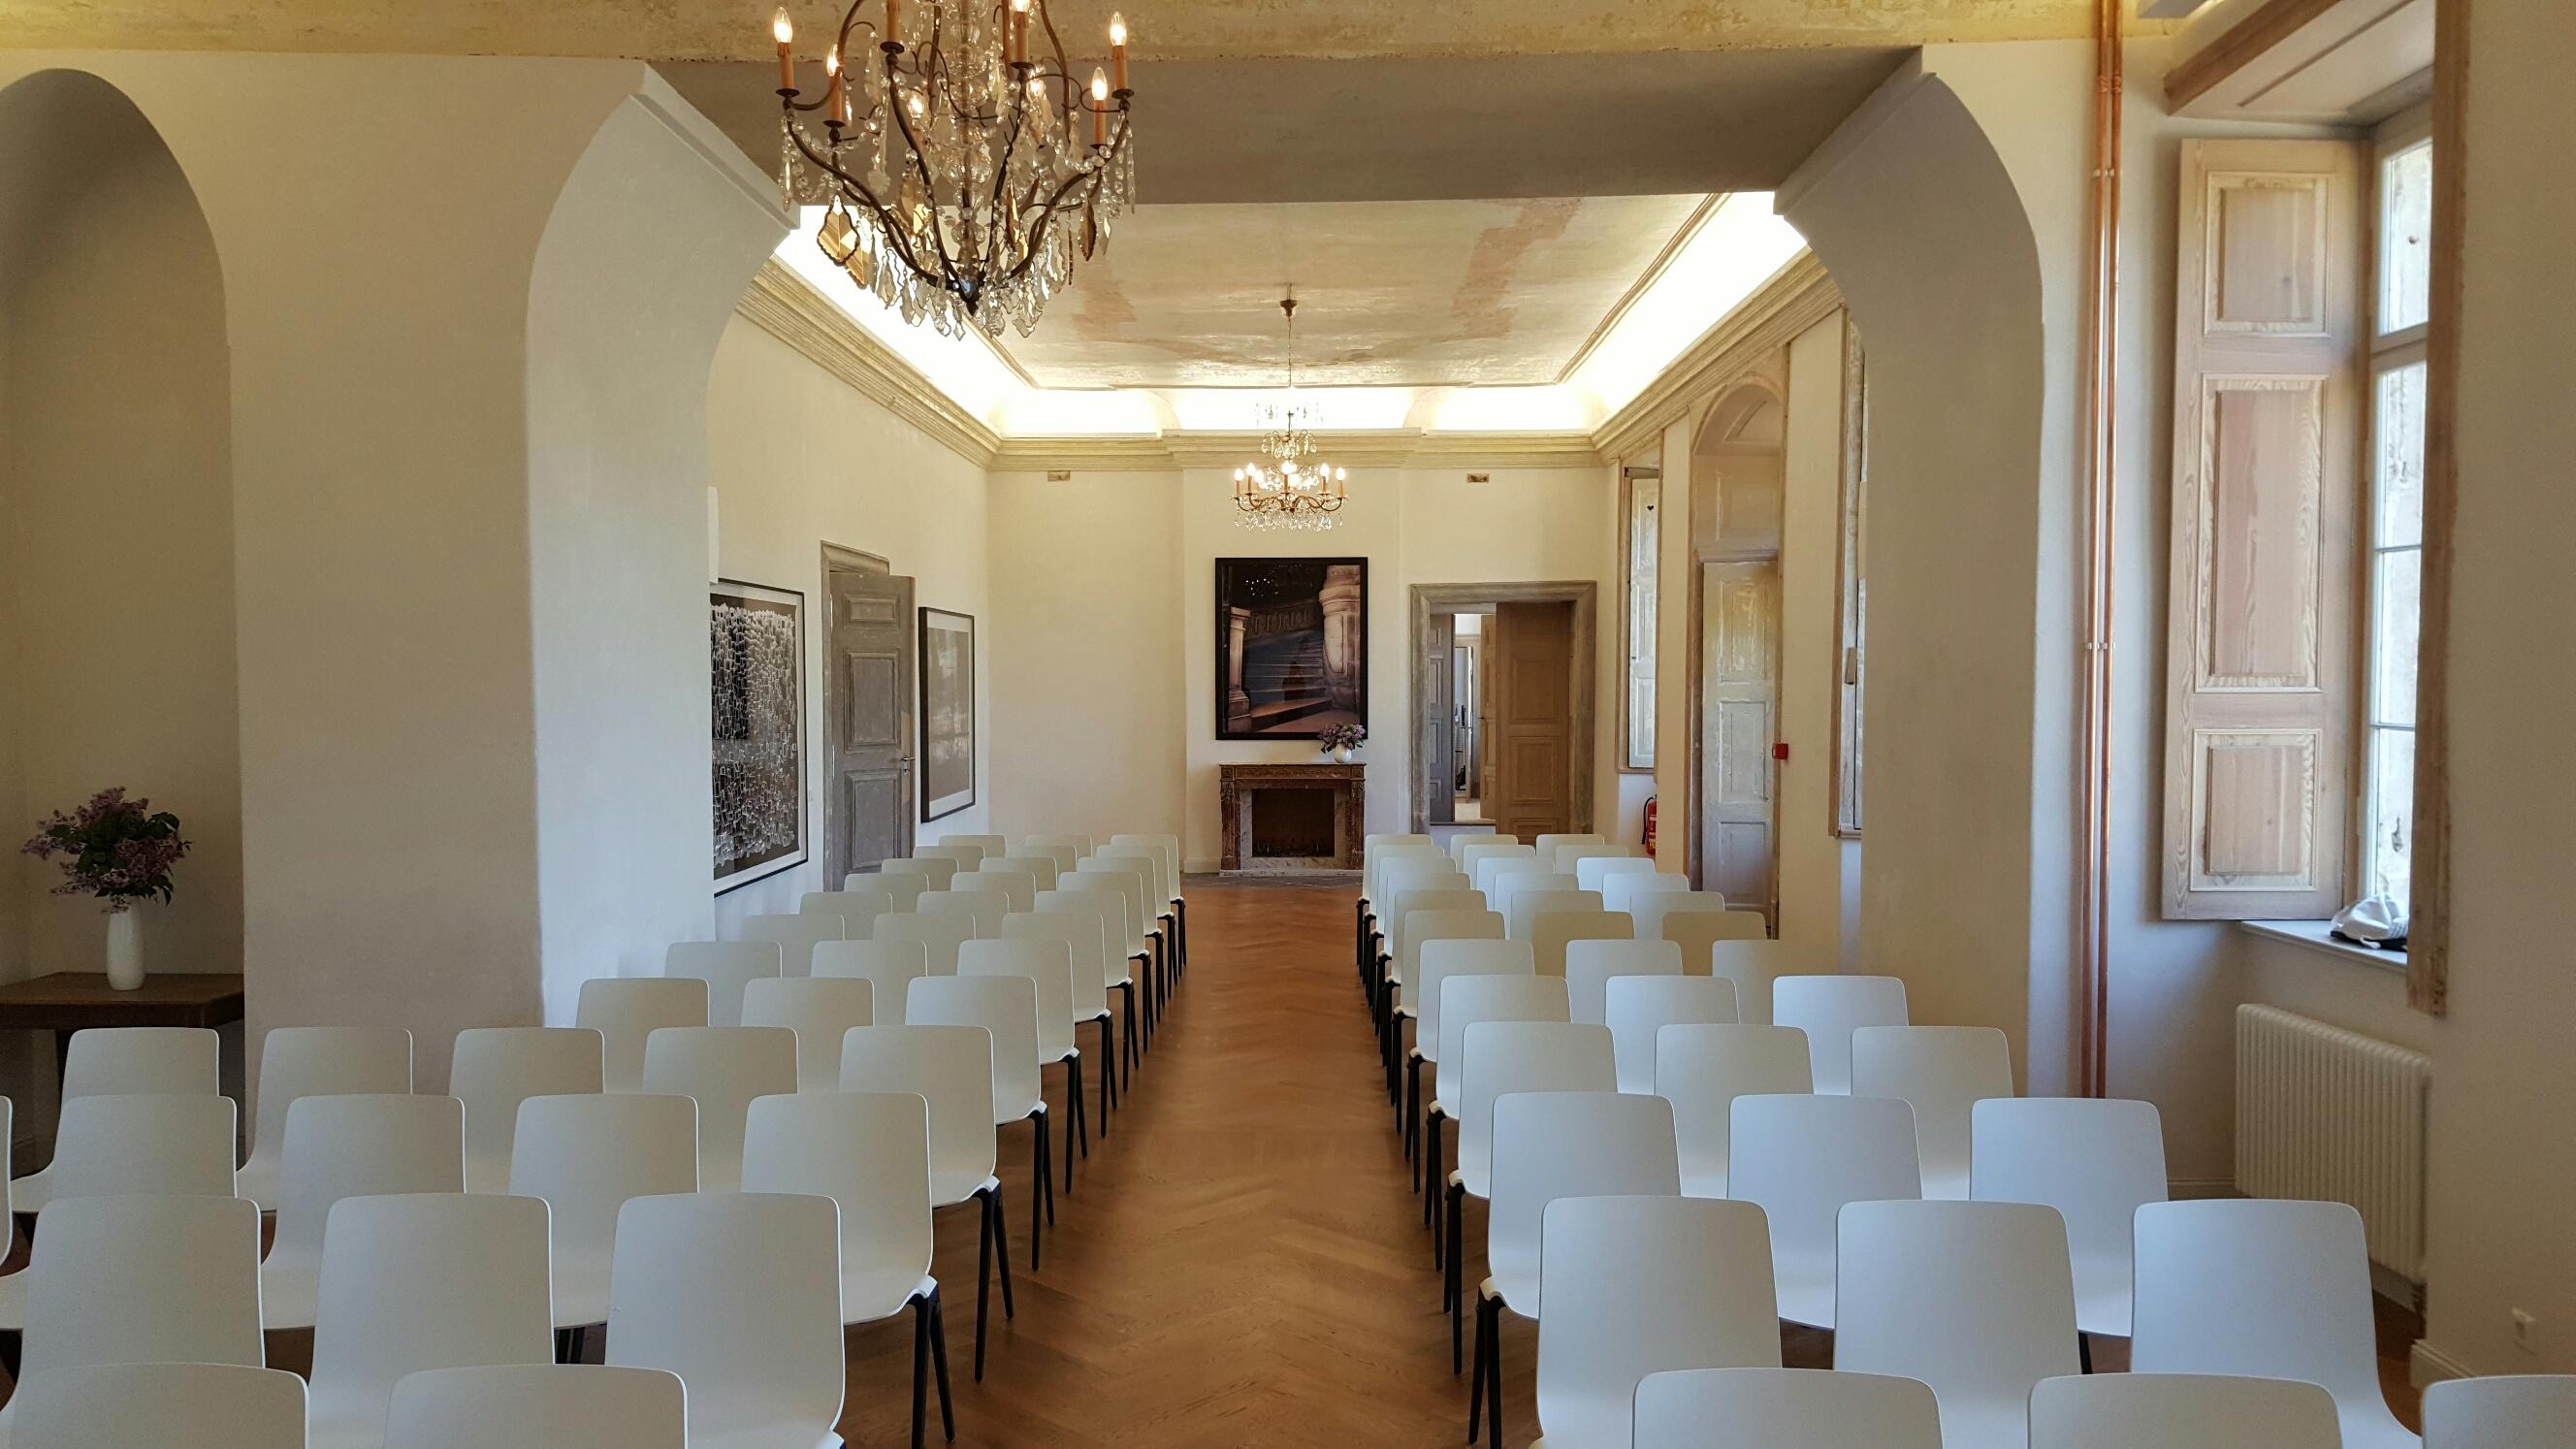 Gartensaal im Erdgeschoss für bis zu 130 Personen